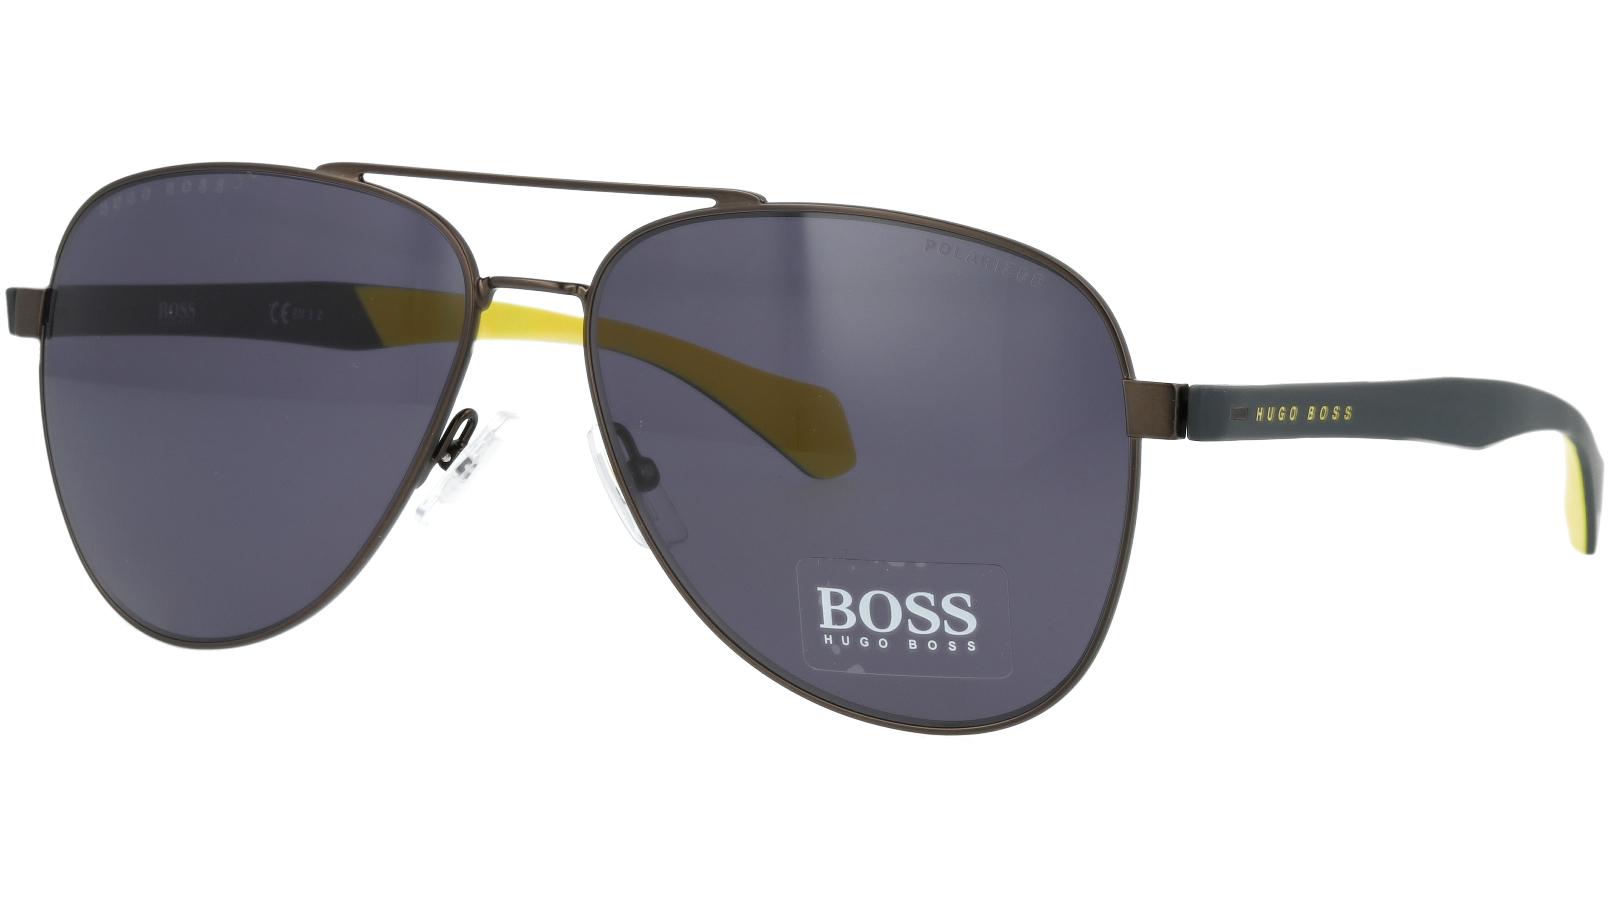 HUGO BOSS BOSS1077/S 003IR 60 MATT Sunglasses